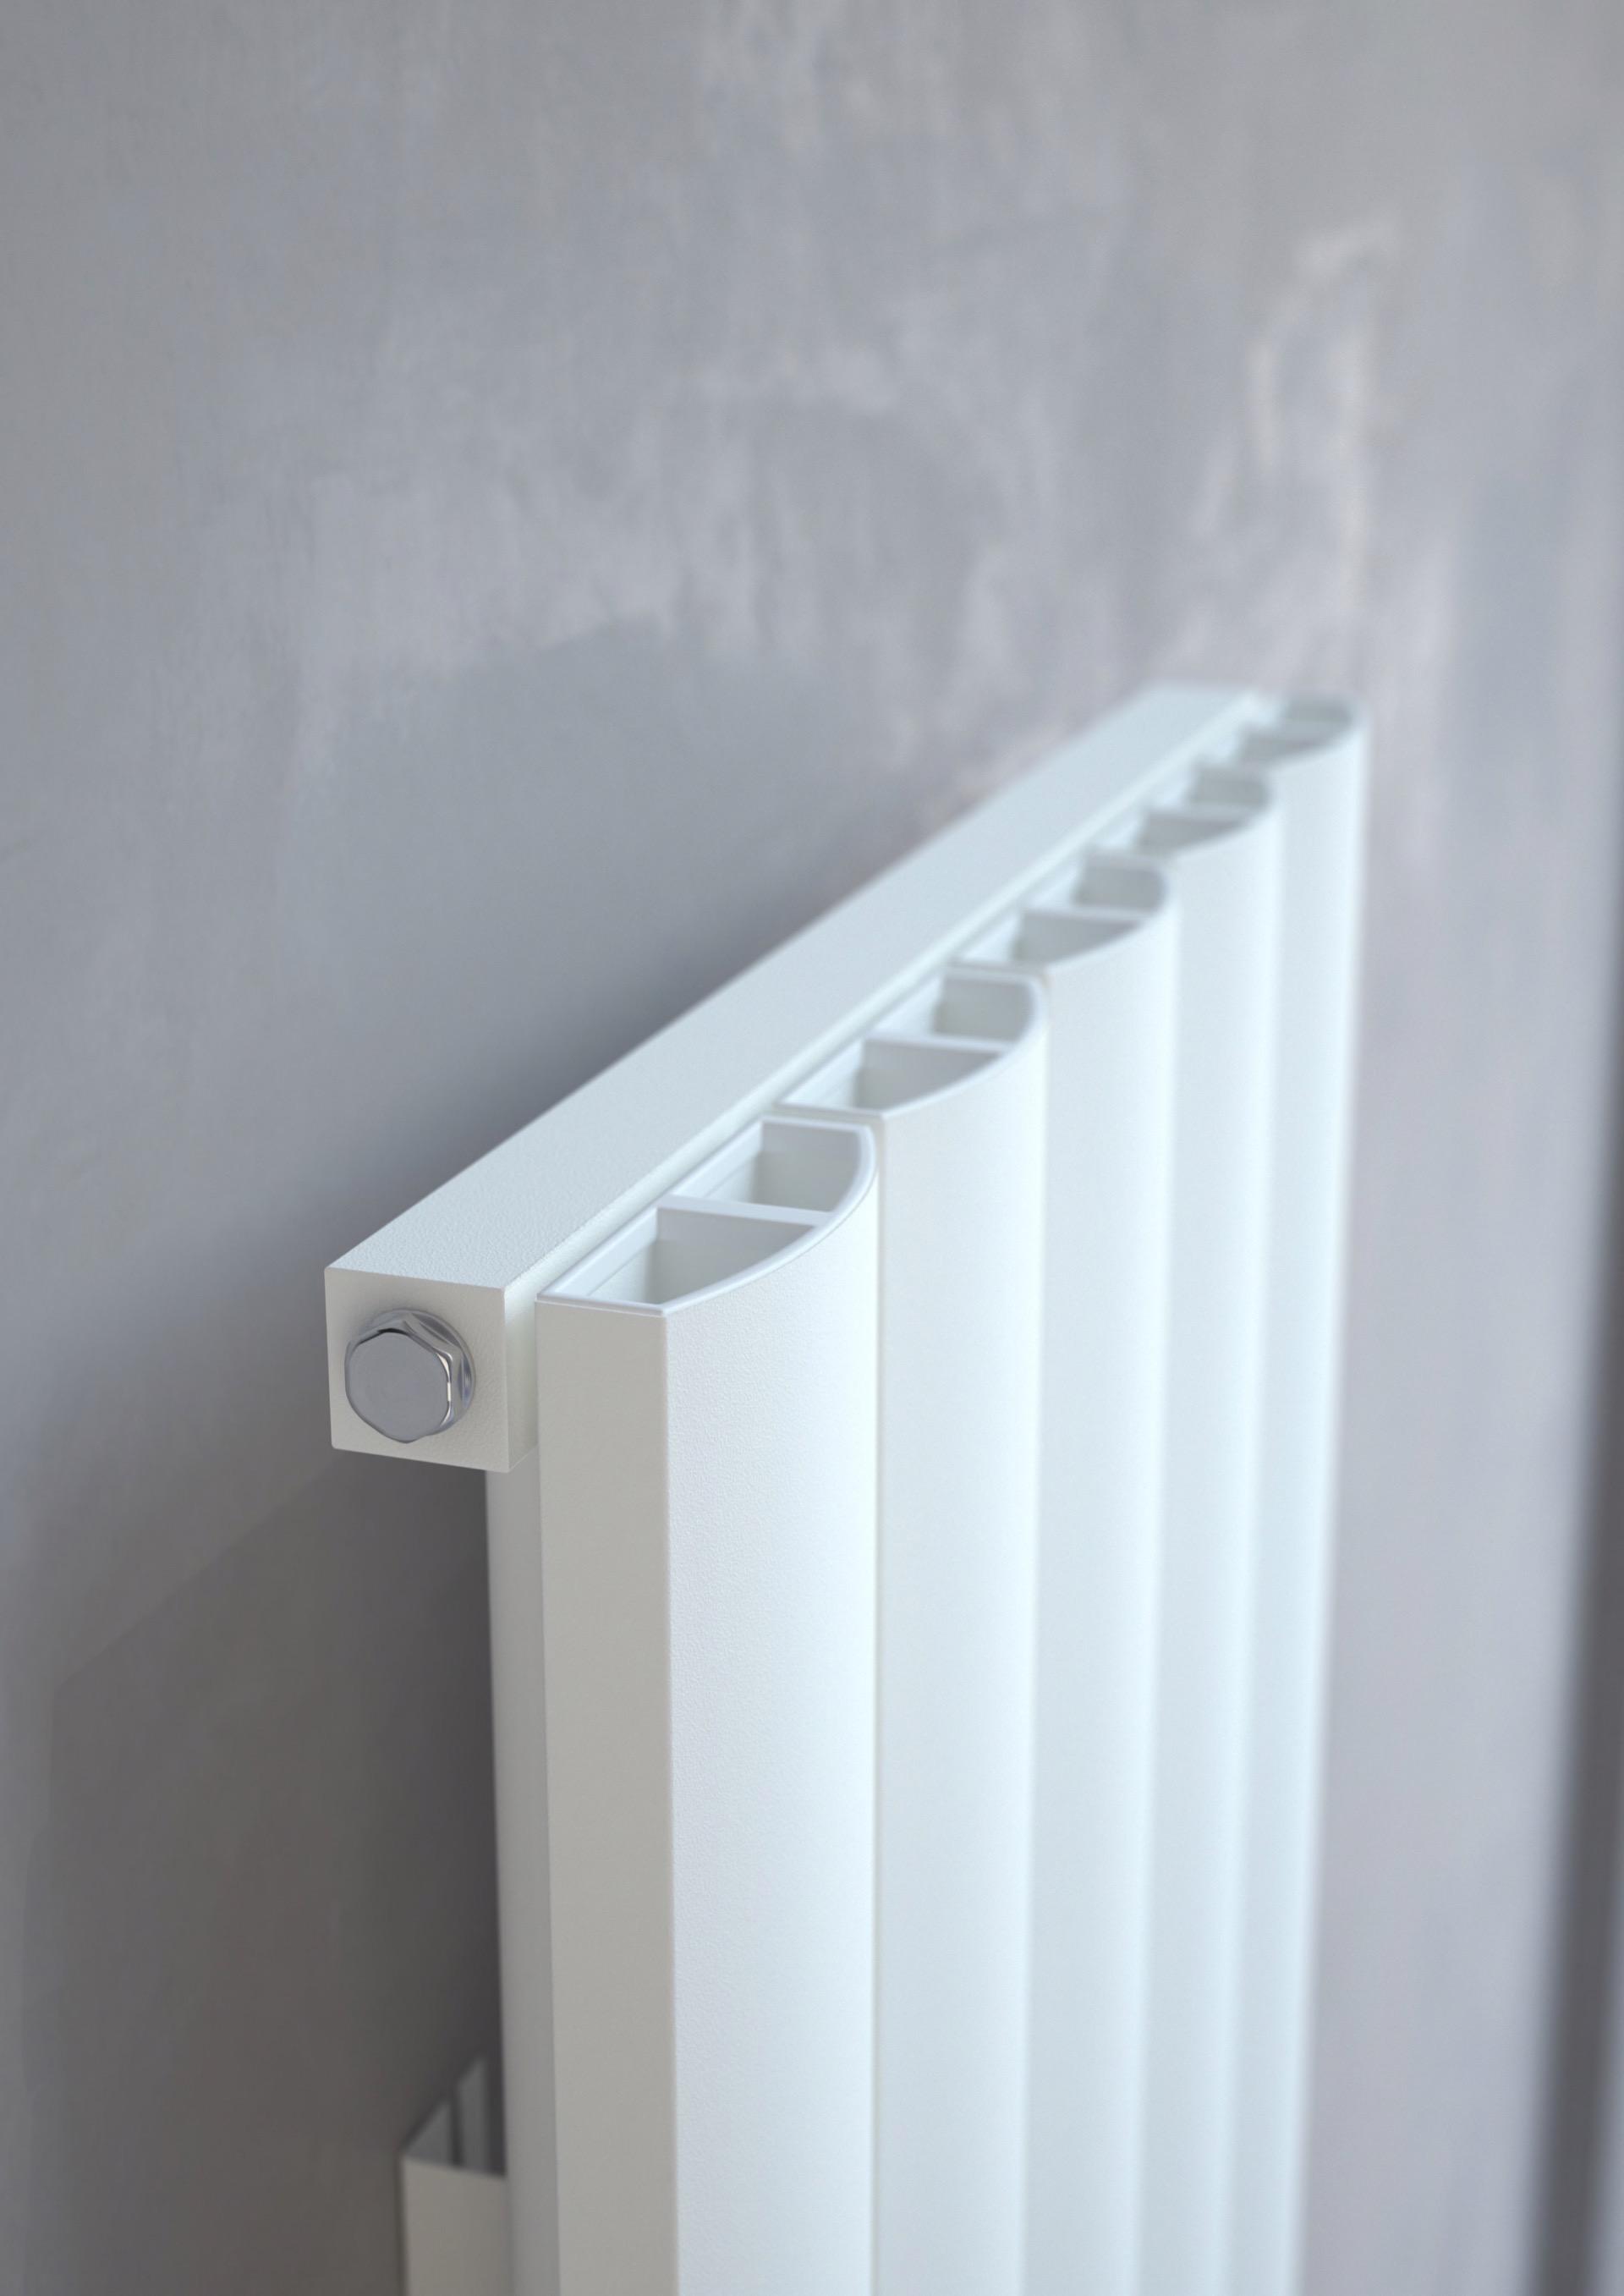 Kudox AluLite ARC Aluminium Radiator Vertical - Heating Bargains ...